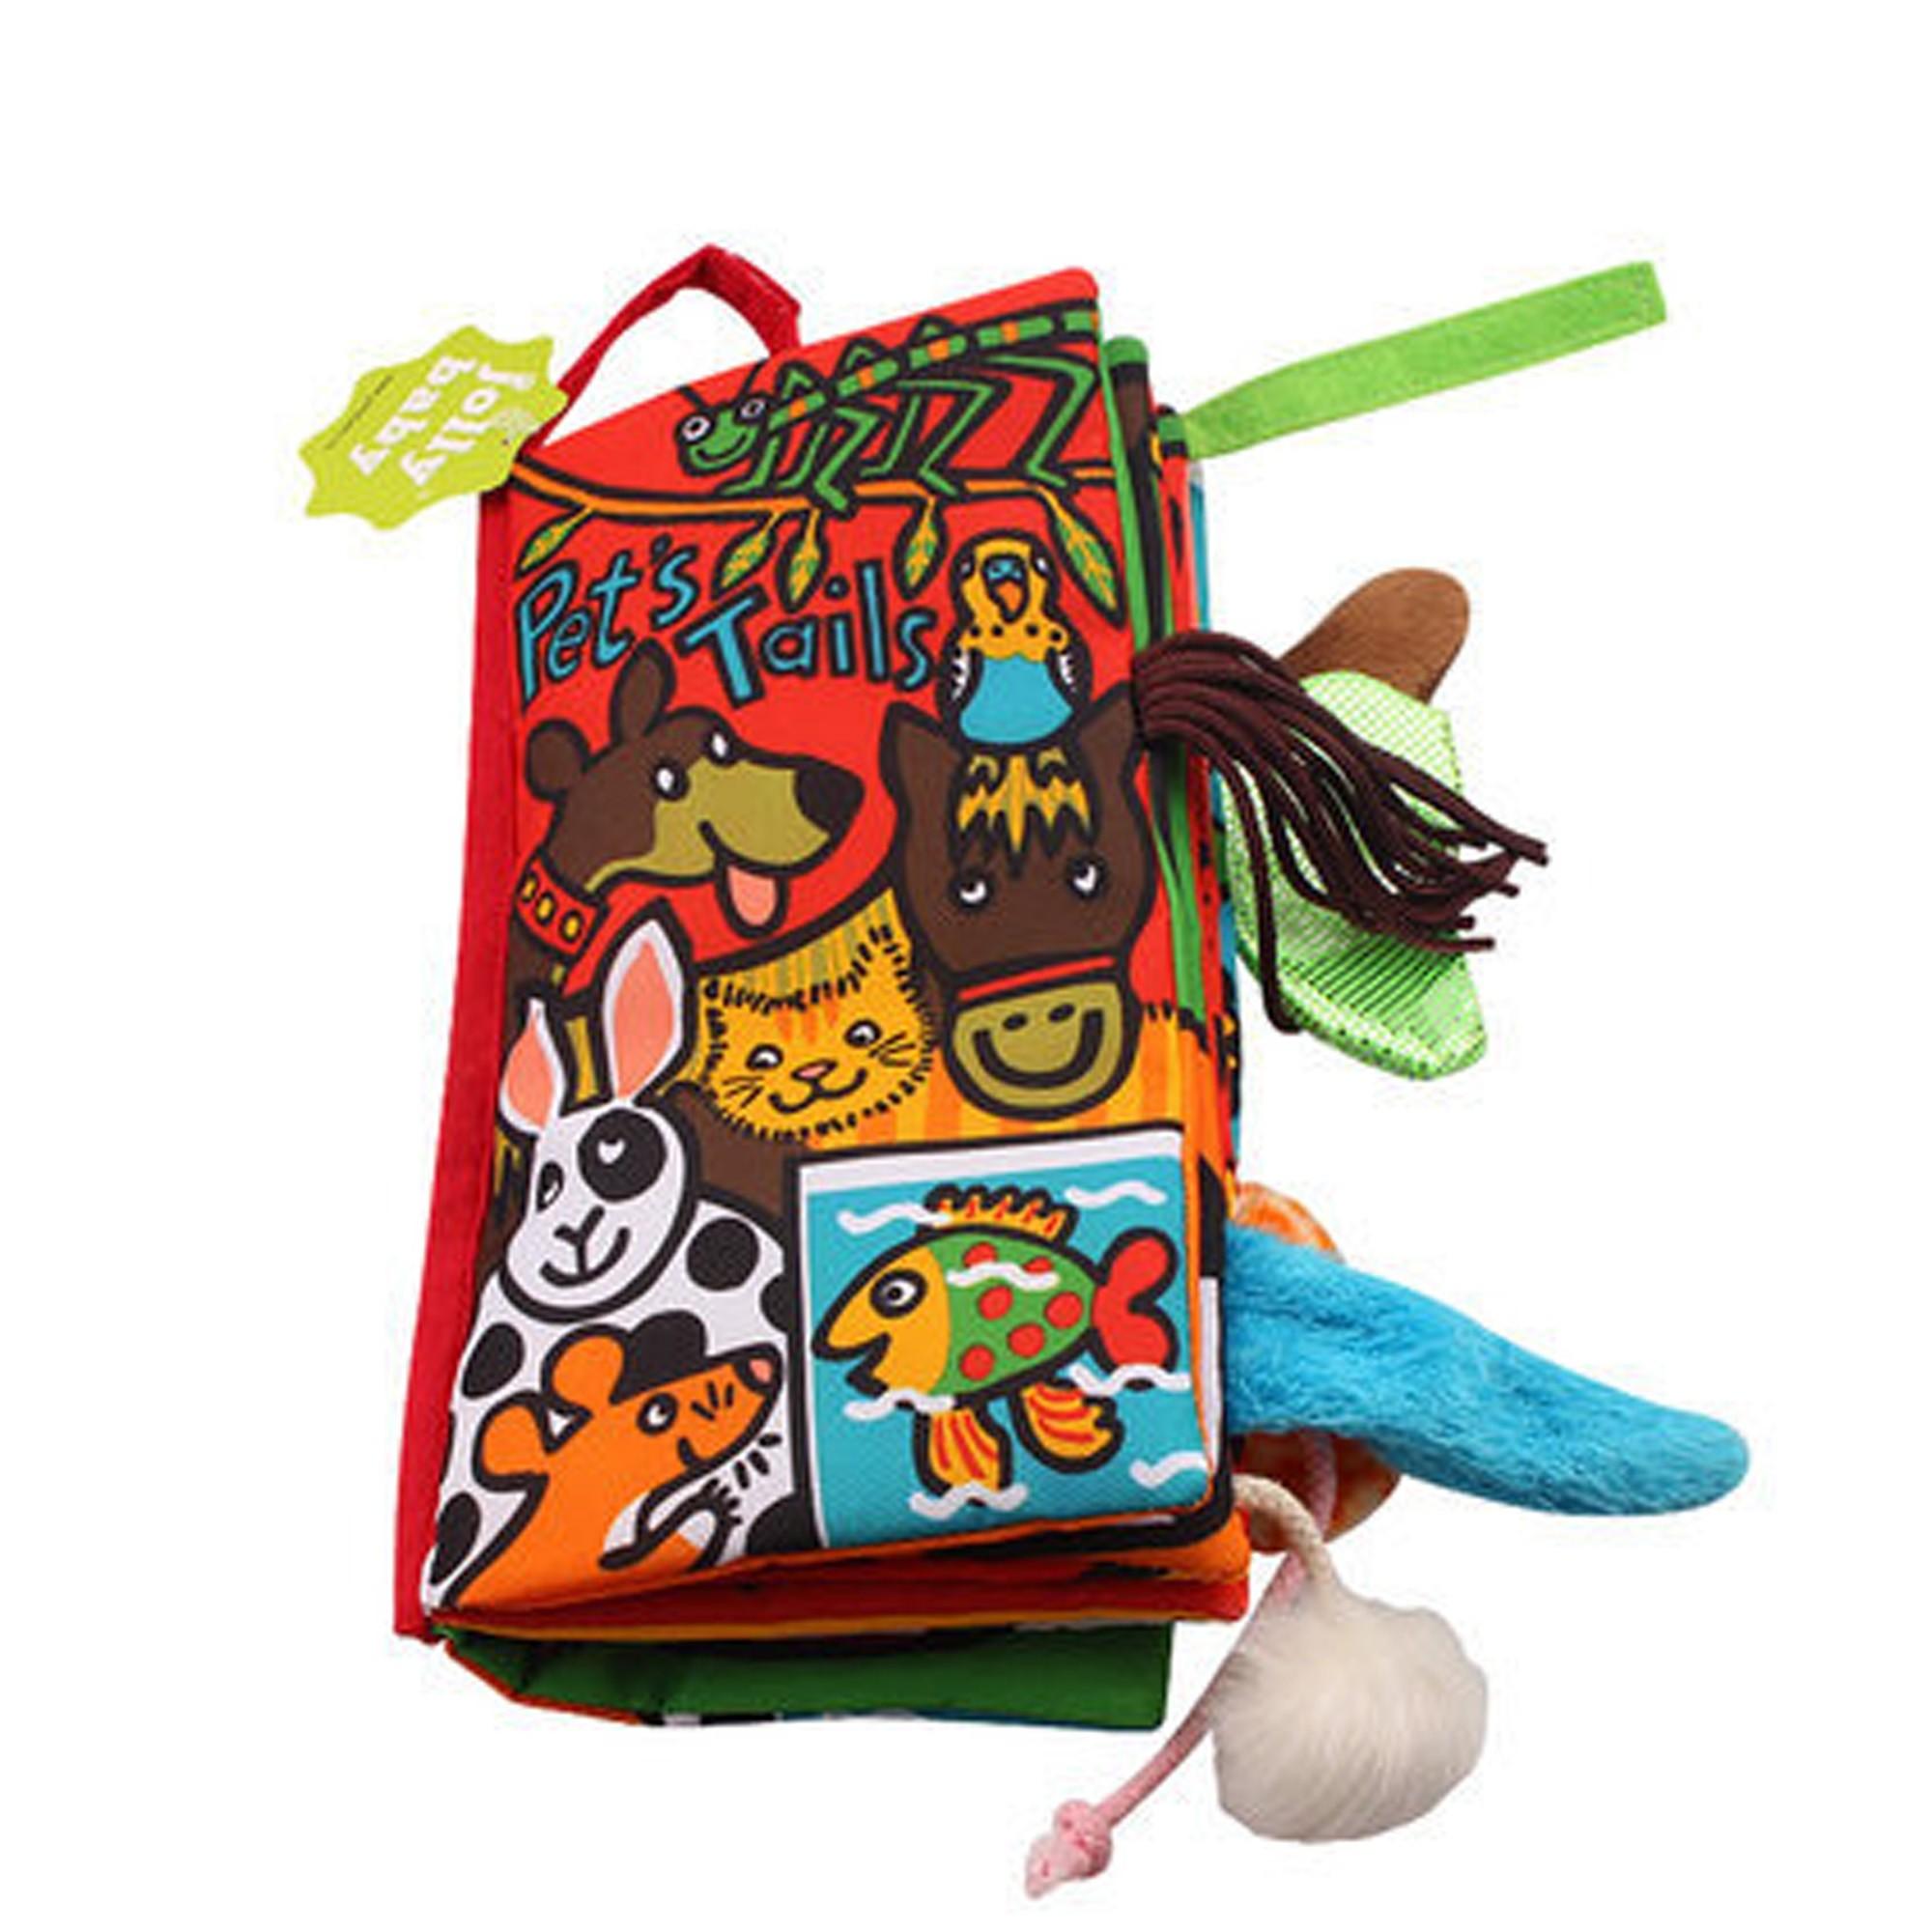 Jollybaby Pet's Tails Soft Cloth Intelligent Development Toy Book (3 Books/Lot)